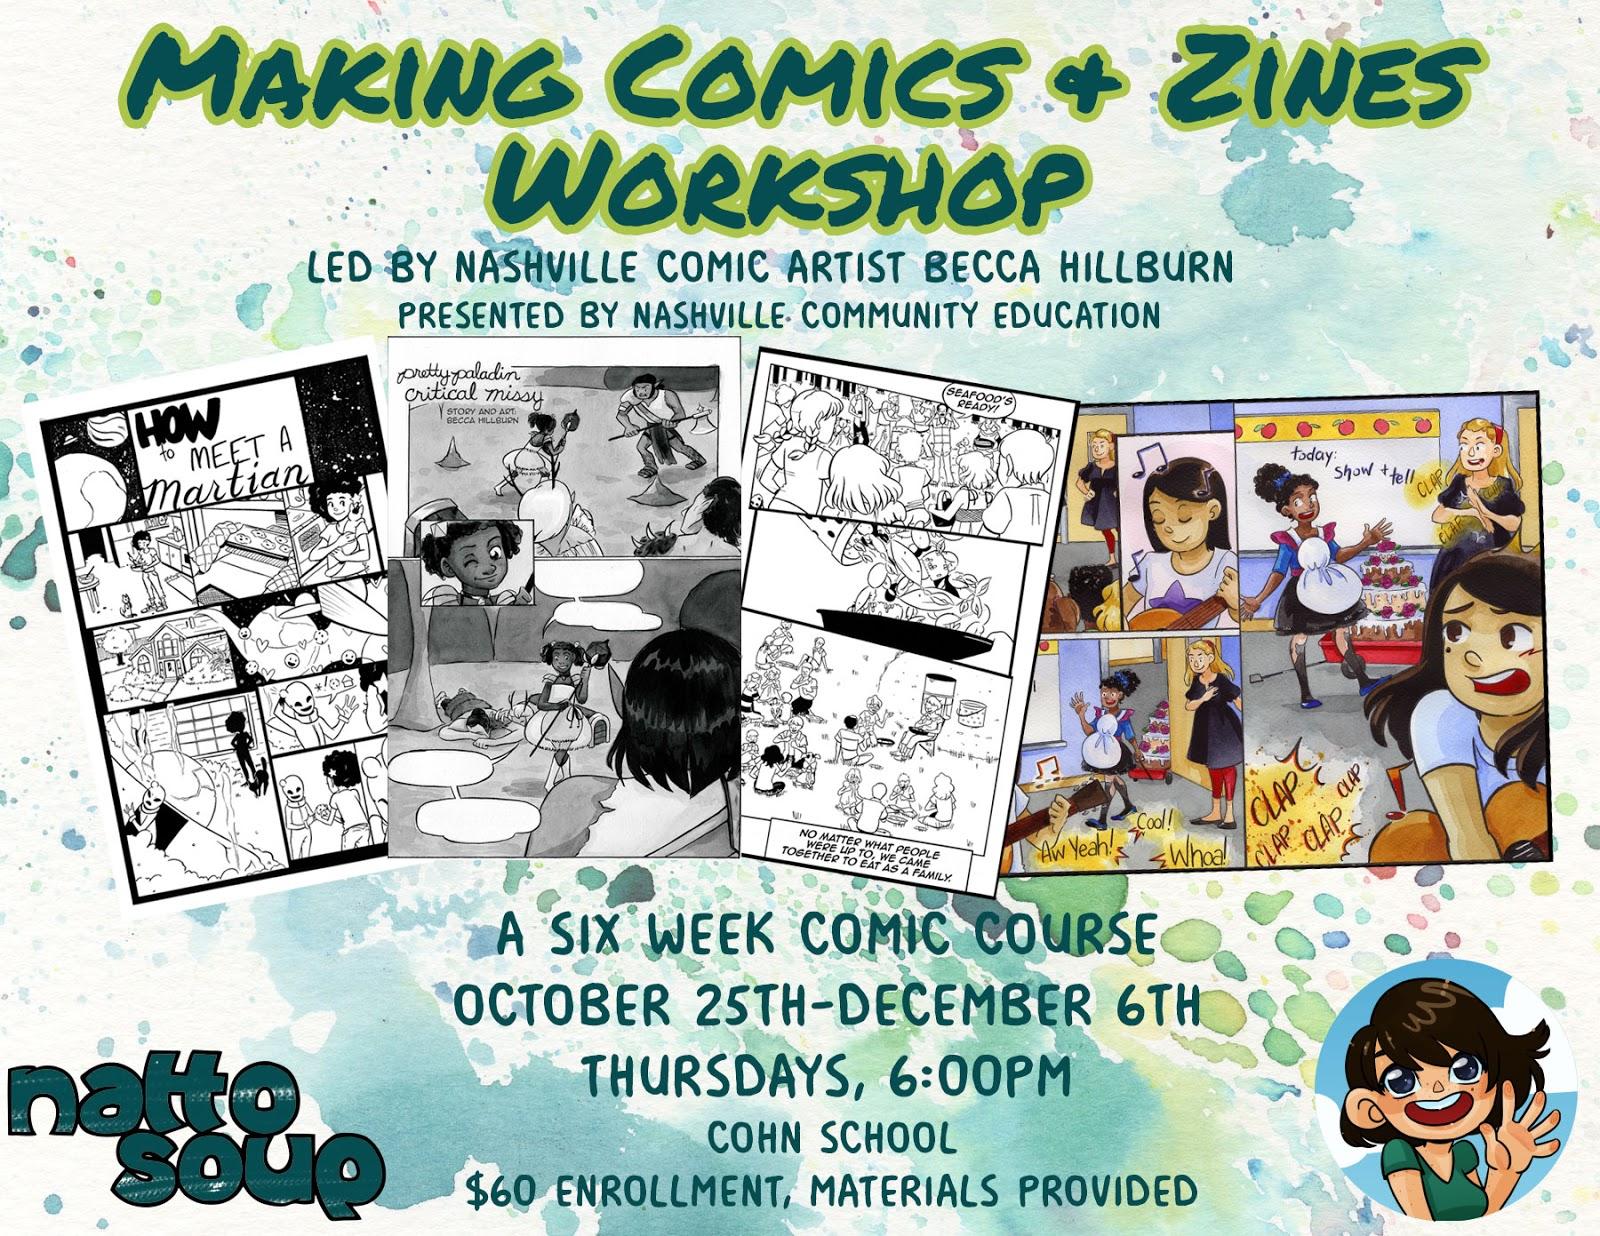 Nattosoup Studio Art and Process Blog: Making Comics and